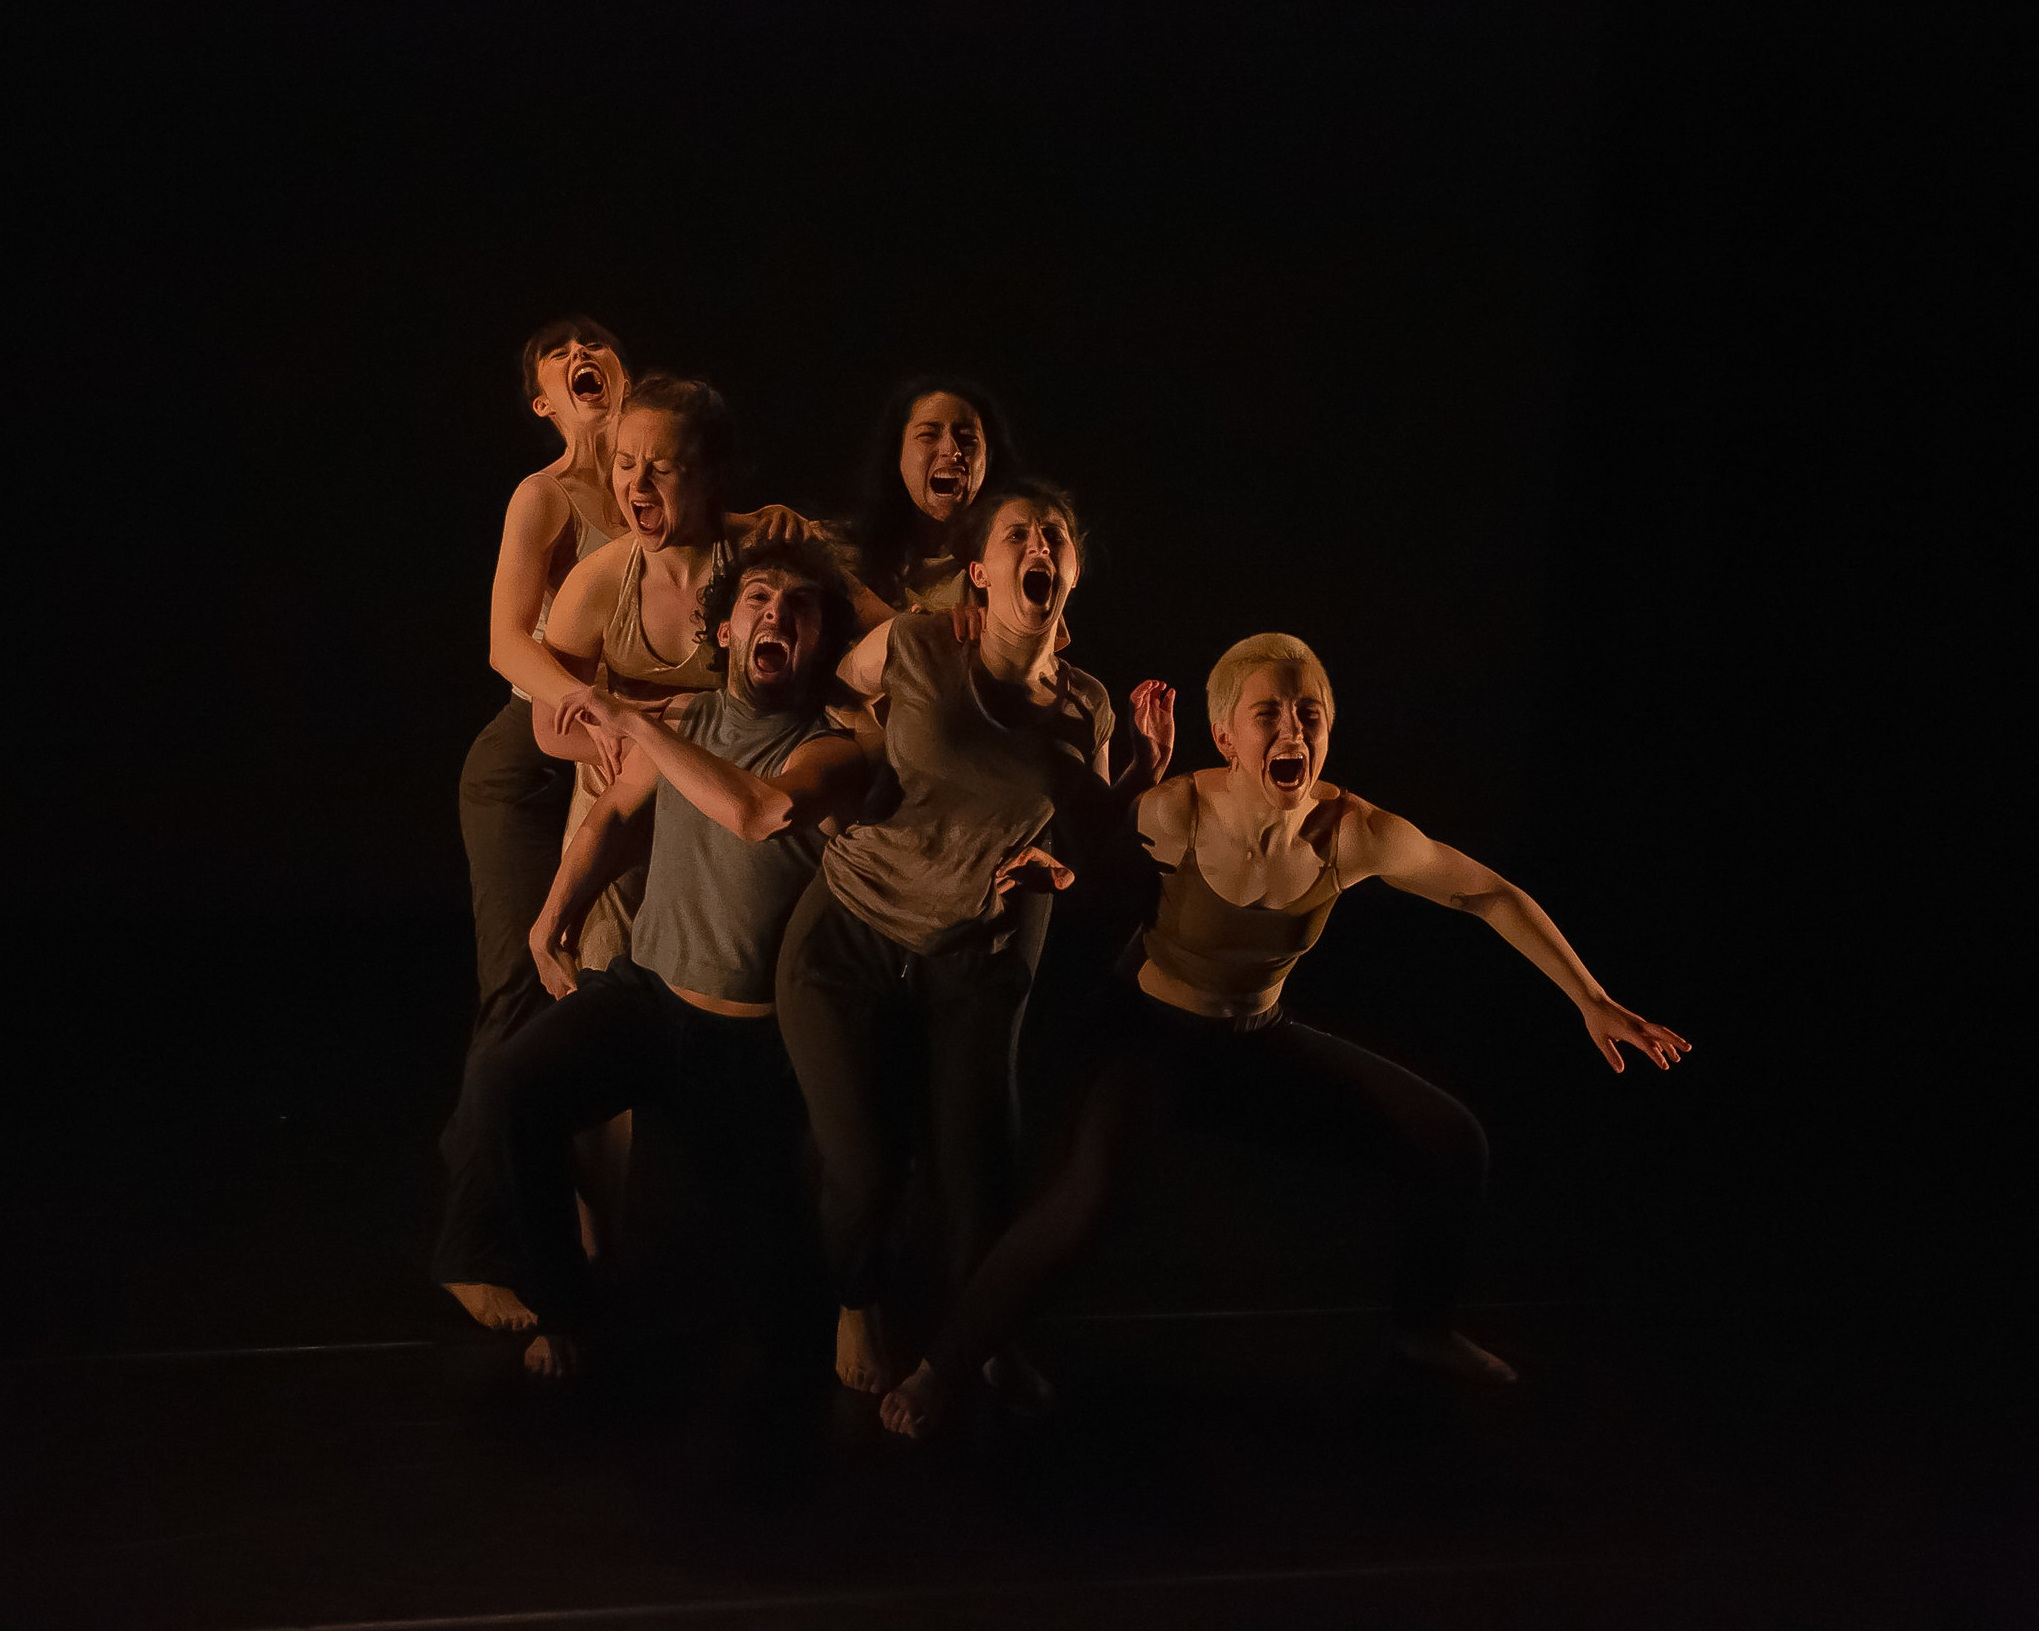 Untitled- In Rehearsal (Hunter College)  Performers: Paris Cullen, Satsu Holmes, Bethany Logan, MJ Markovitz, Chris Tabassi, Lea Torelli  Understudies: Liana Kleinman, Marisa Melito Jenna Miller